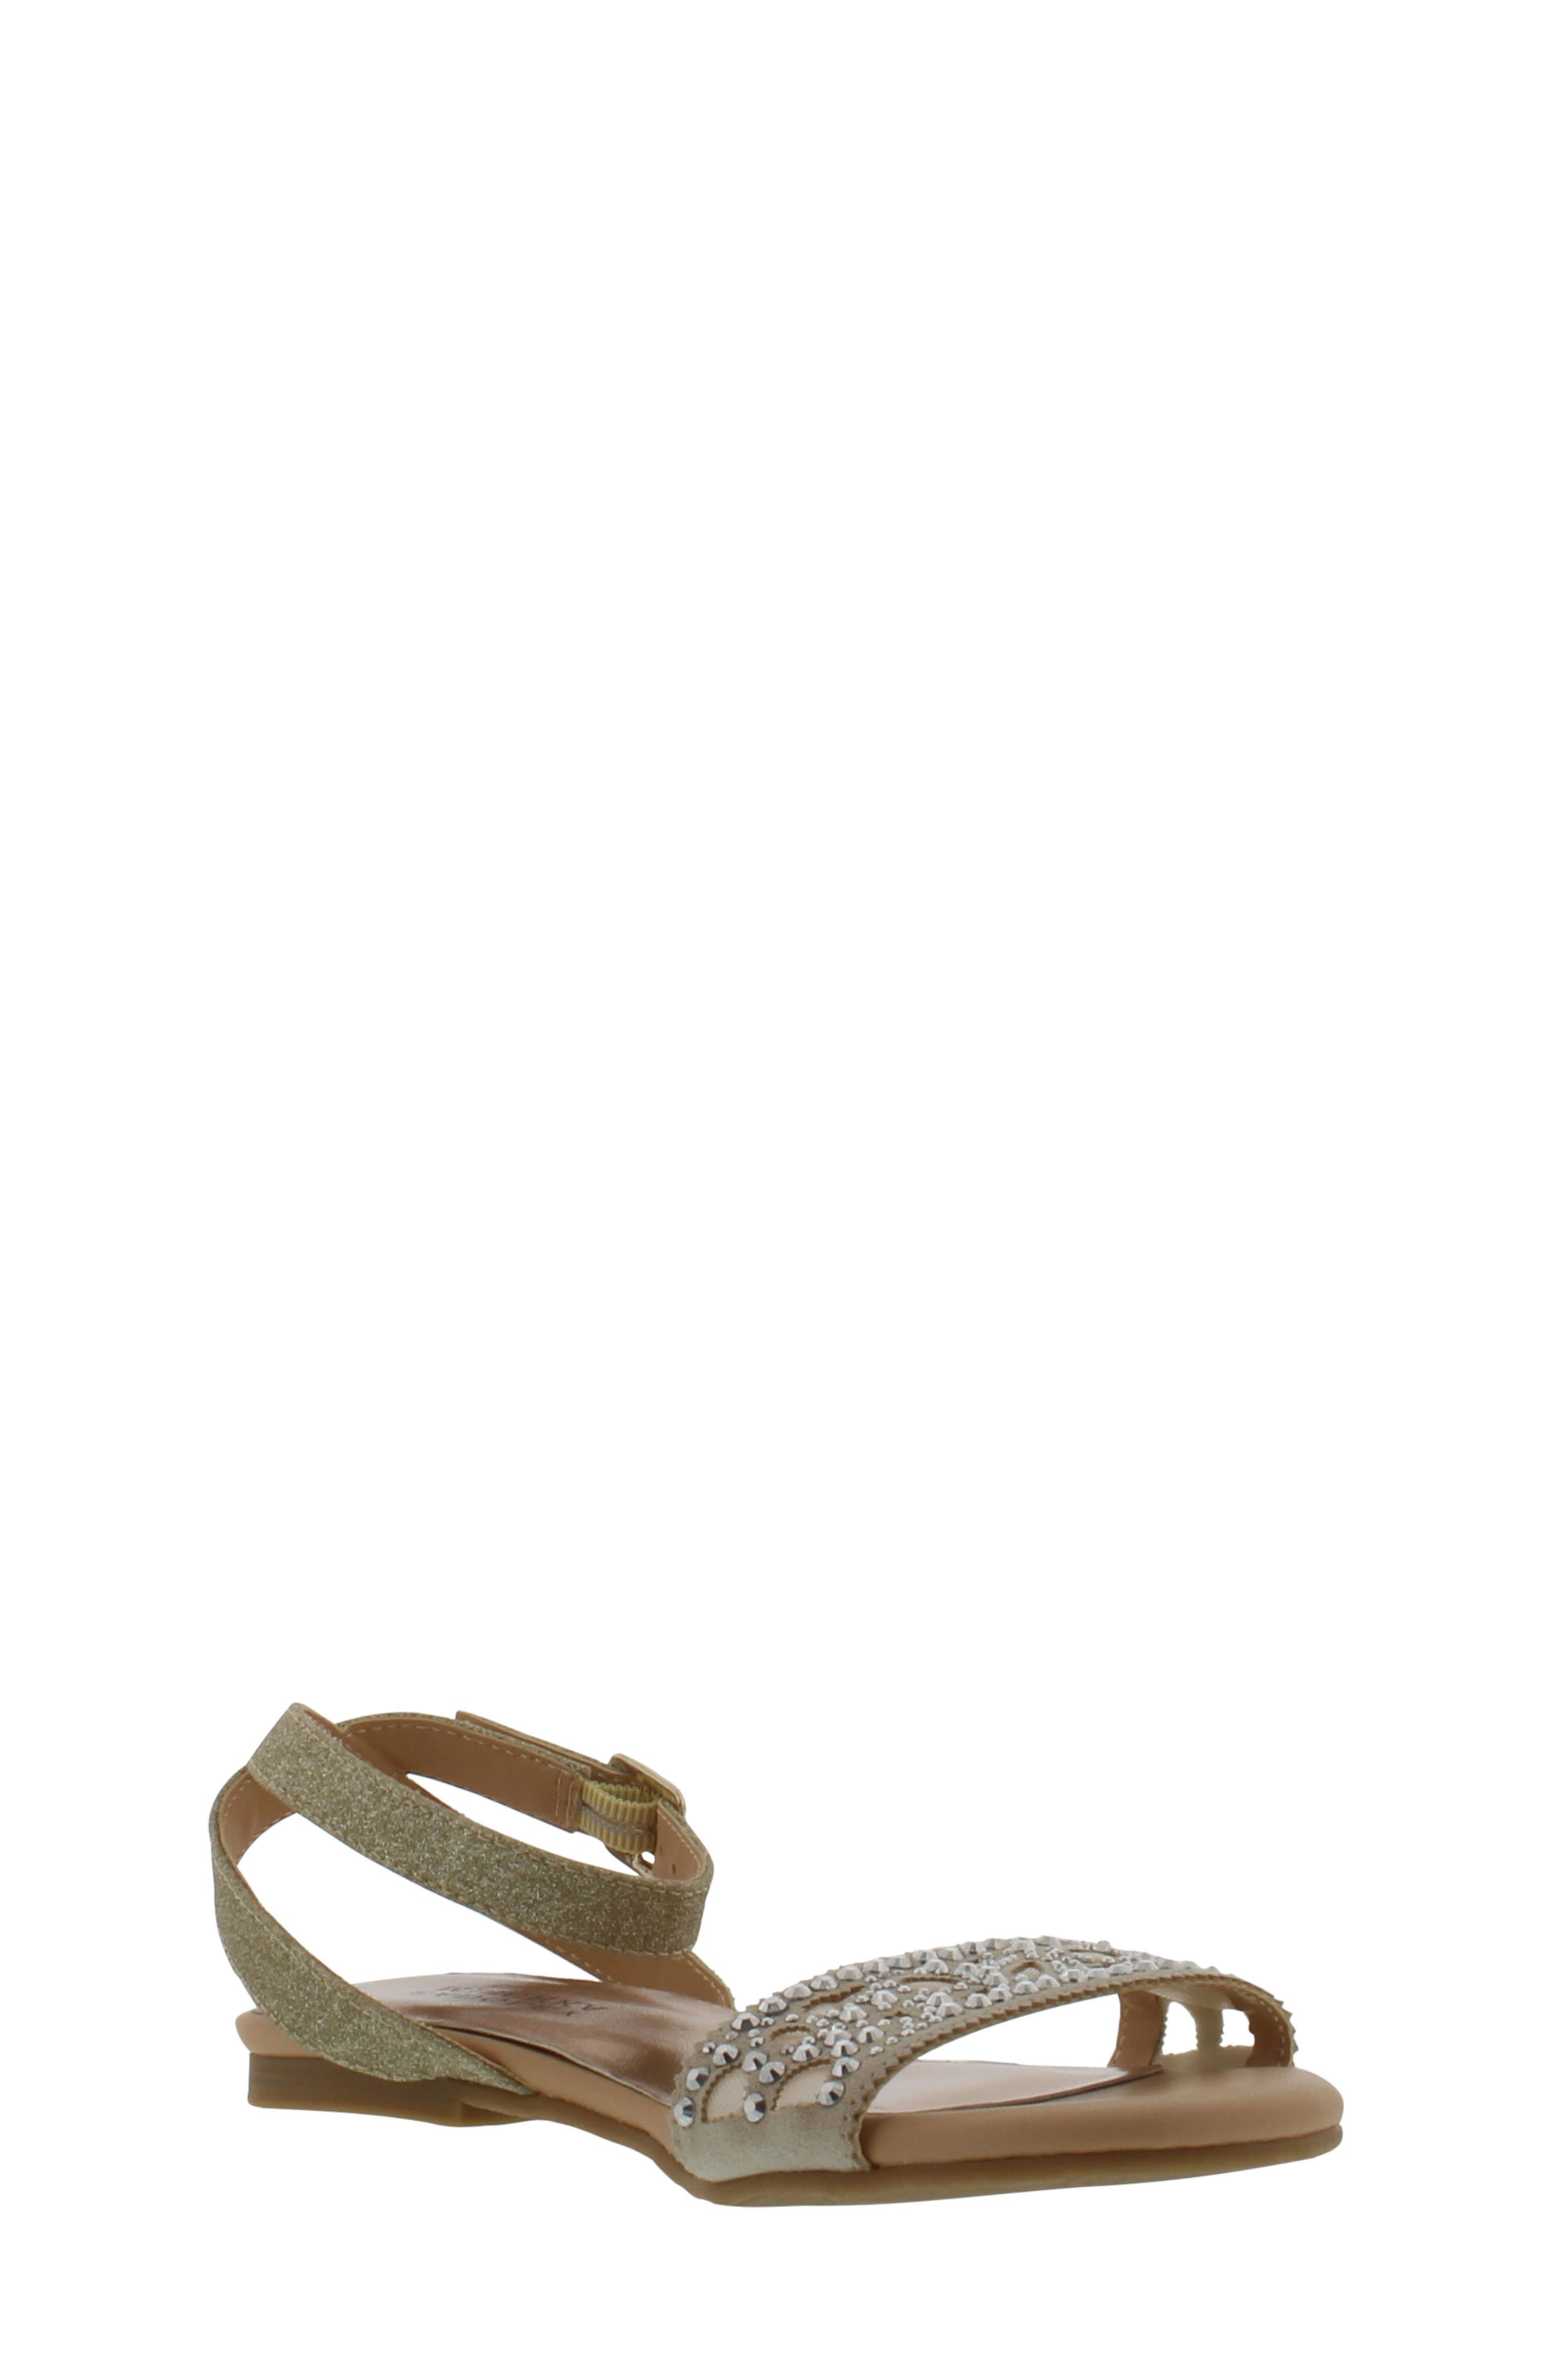 Main Image - Badgley Mischka Cara Embellished Sandal (Toddler, Little Kid & Big Kid)